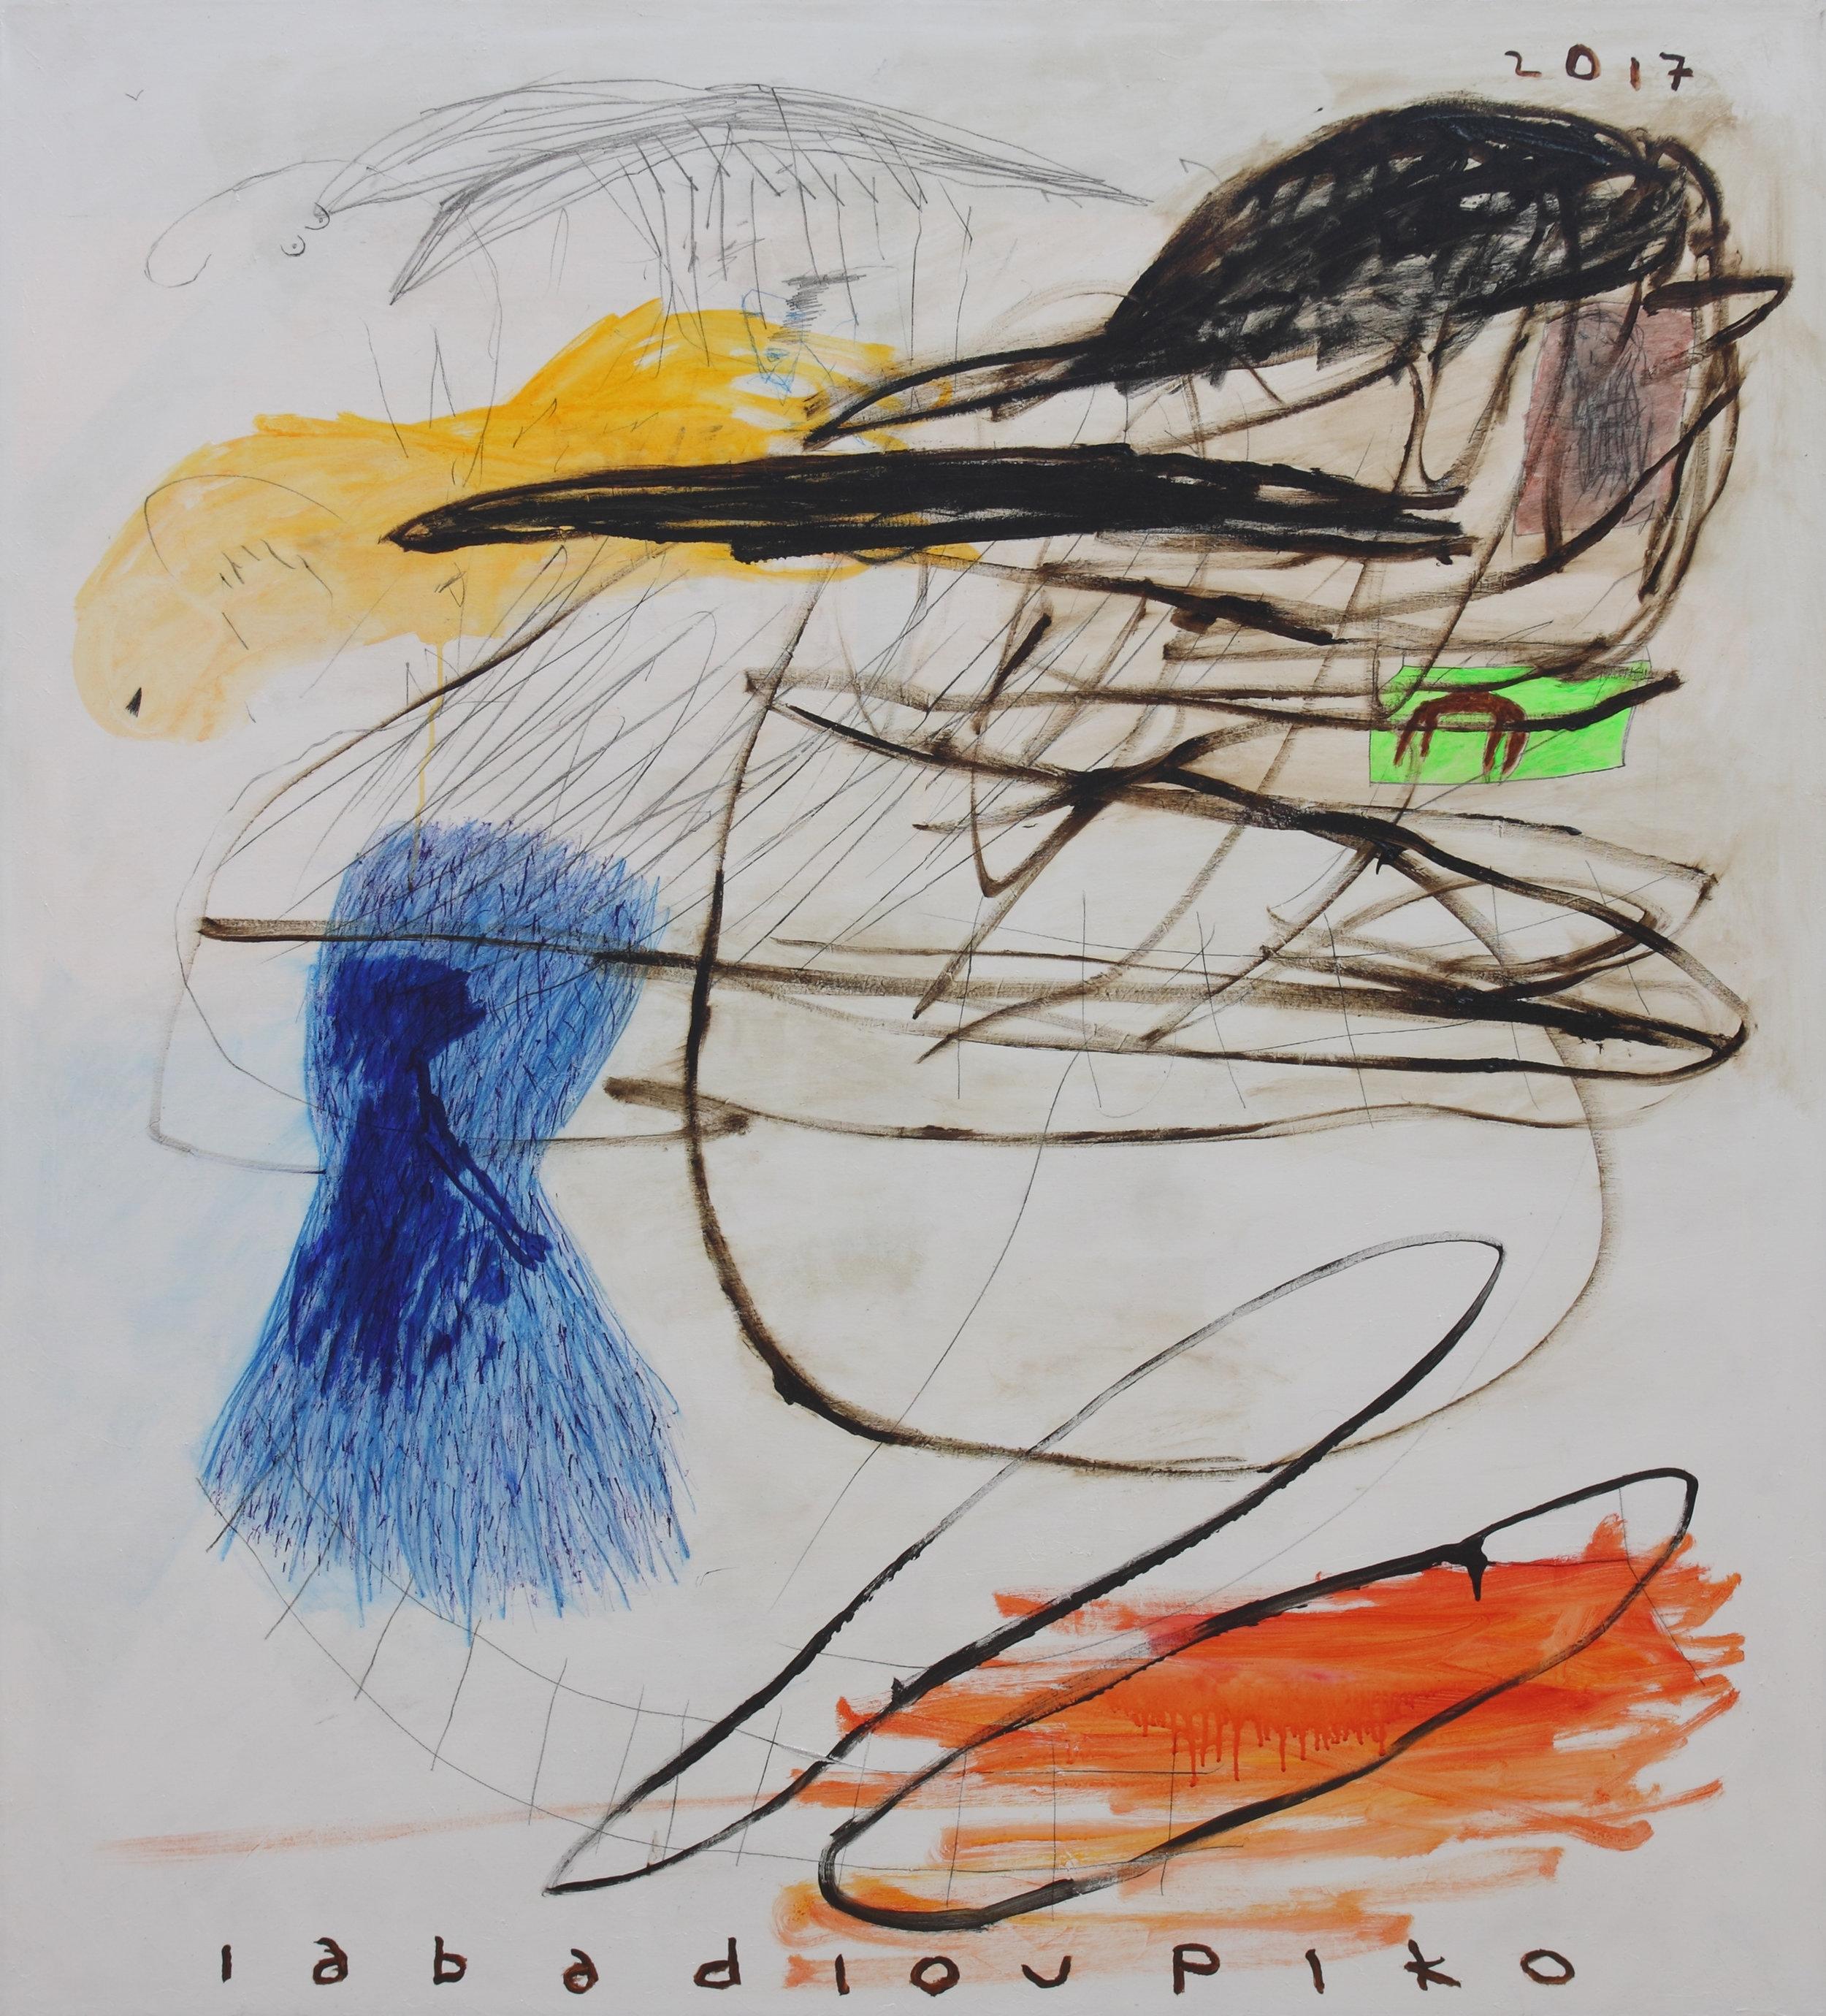 PIKO IABADIOU   Melihat Sunyi Disekeliling Putih,  2016 acrylic bitumen pencil on canvas 160 x 145 cm